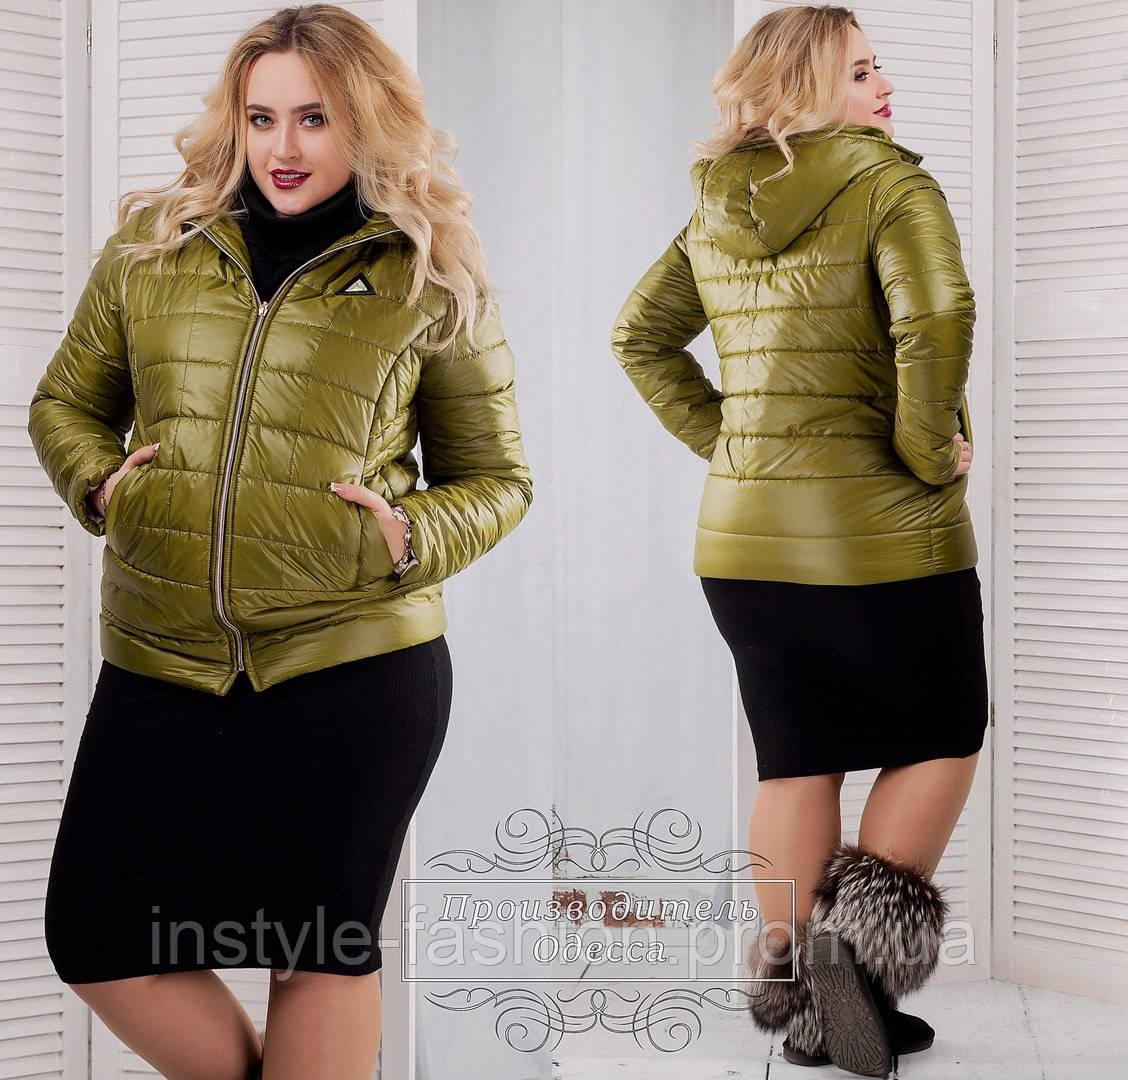 Куртка теплая с капюшоном плащевка на синтепоне 200 до 56 размера